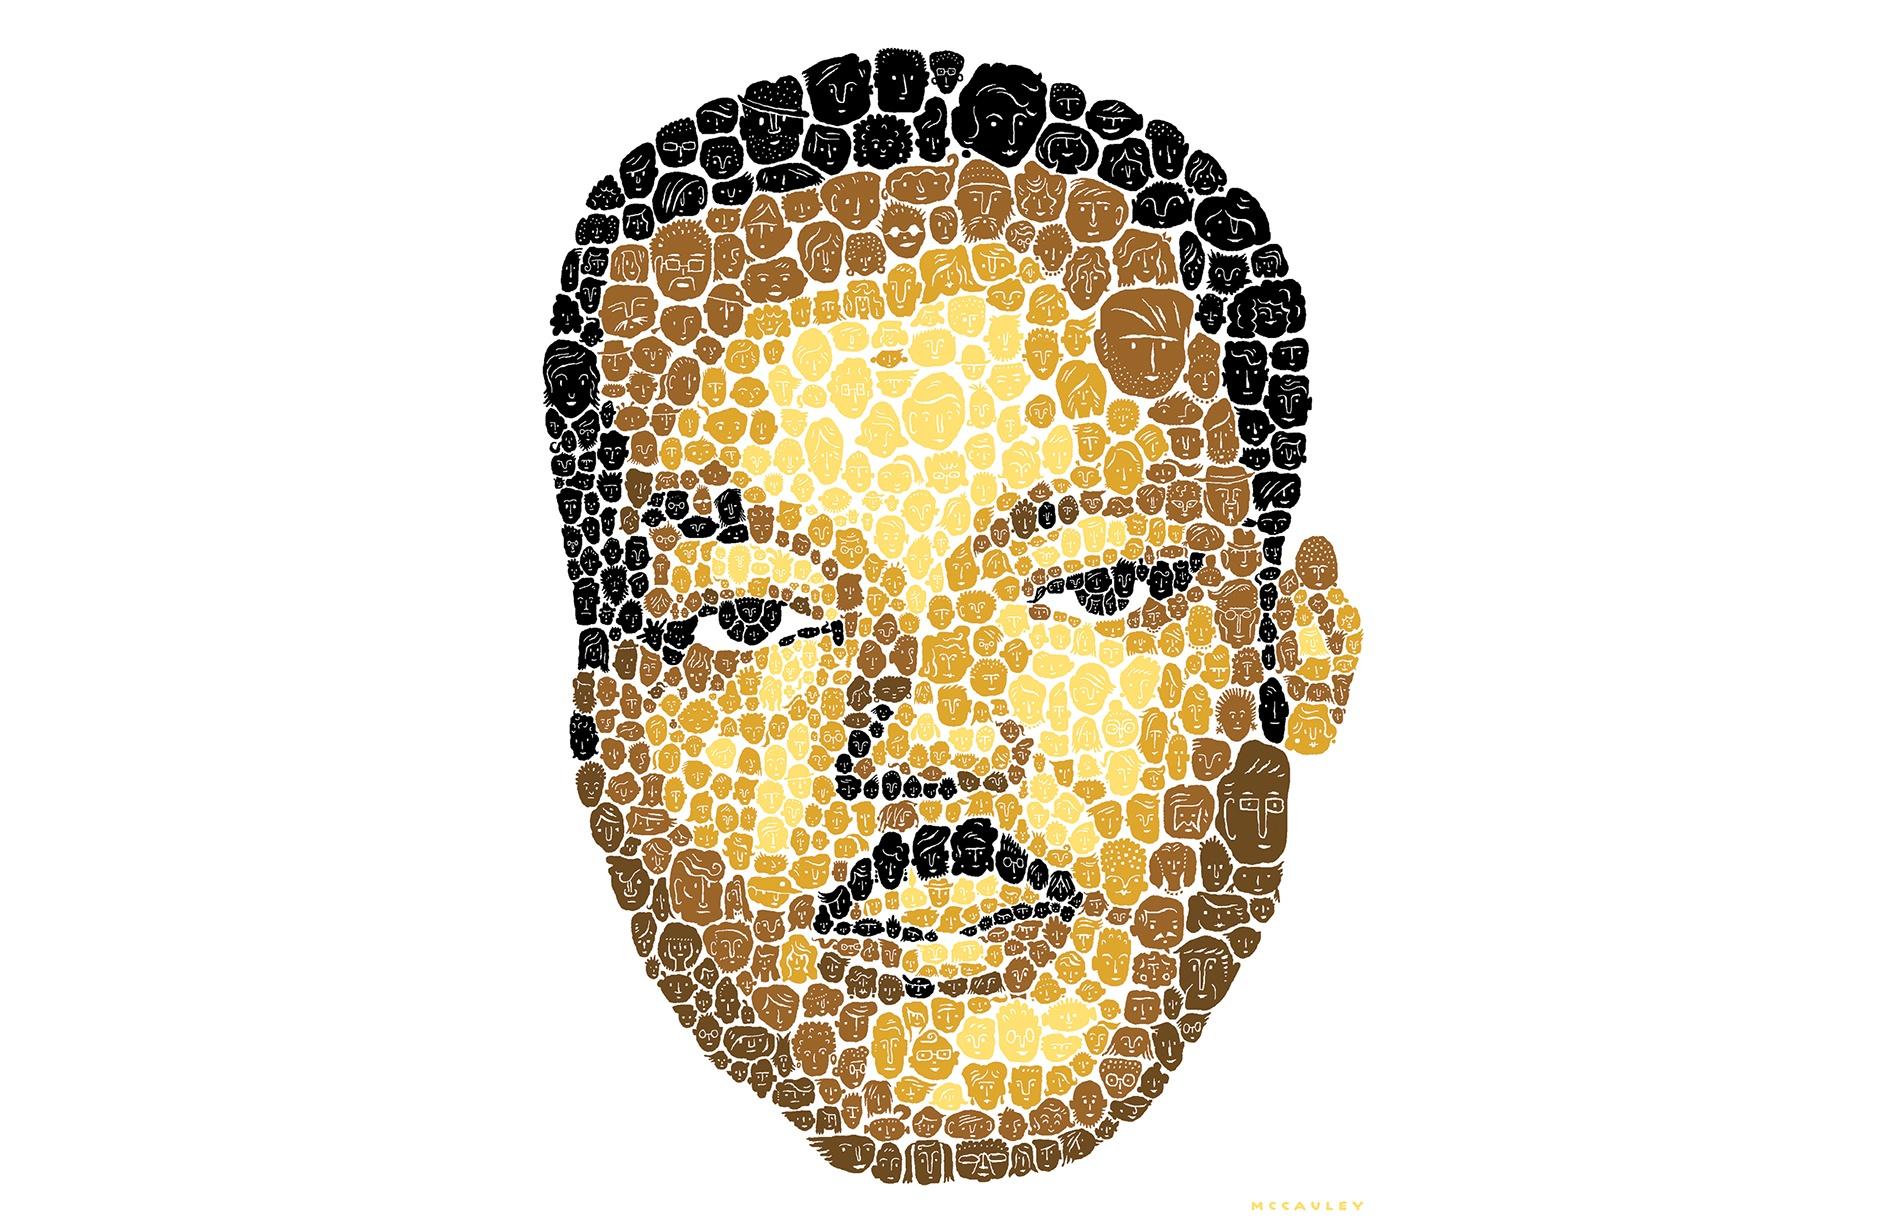 portrait of MLK